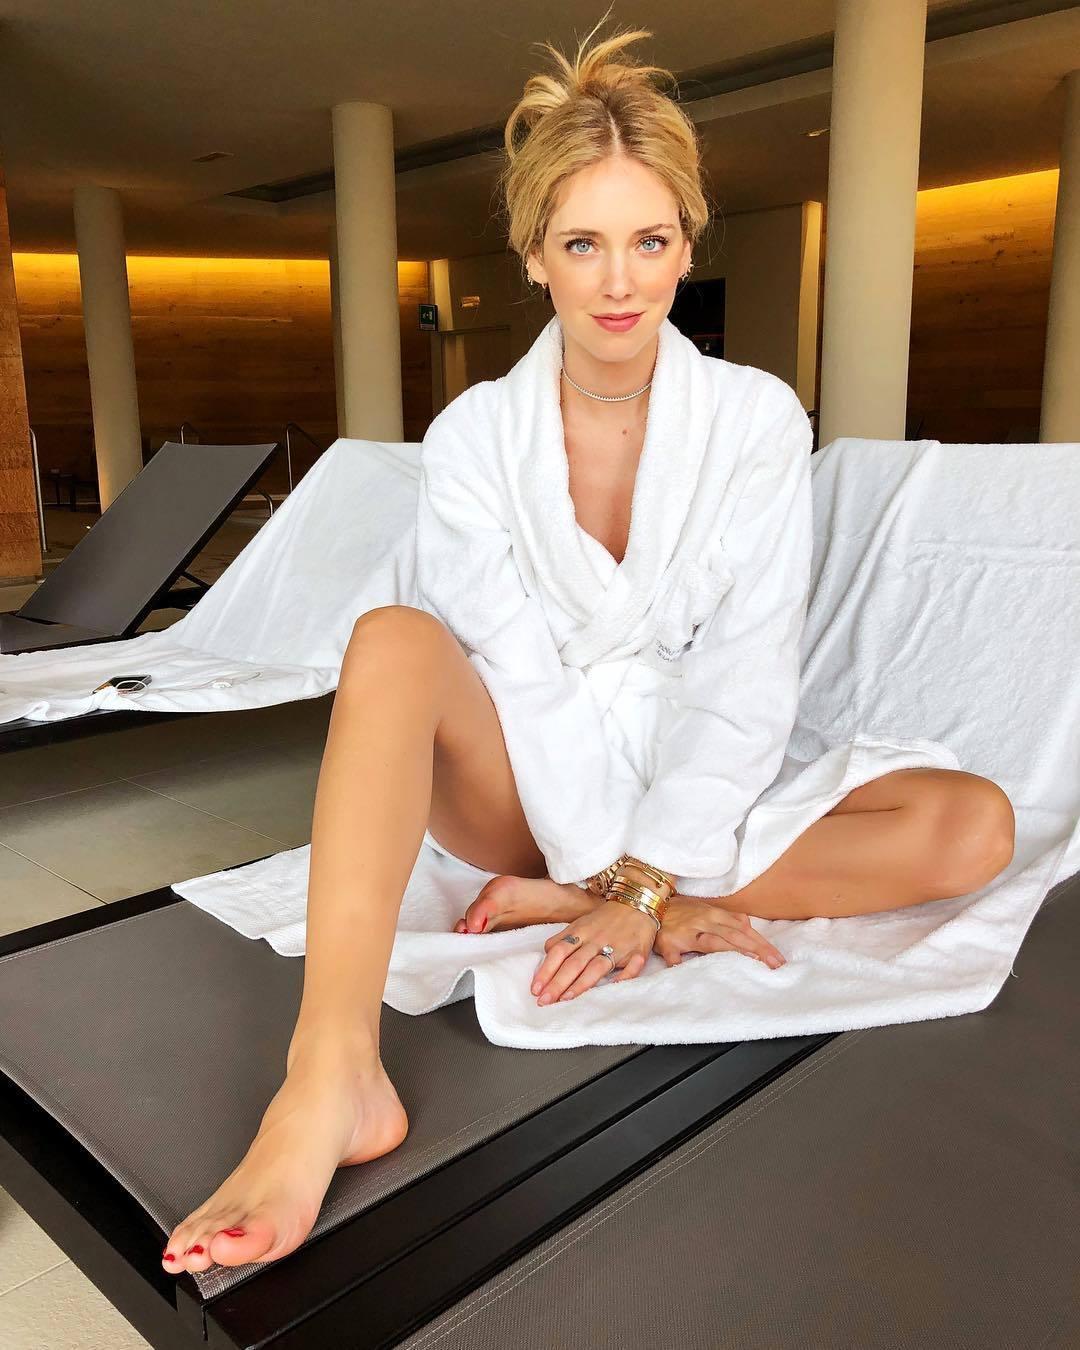 Feet Chiara Ferragni naked (33 photos), Pussy, Bikini, Feet, braless 2015